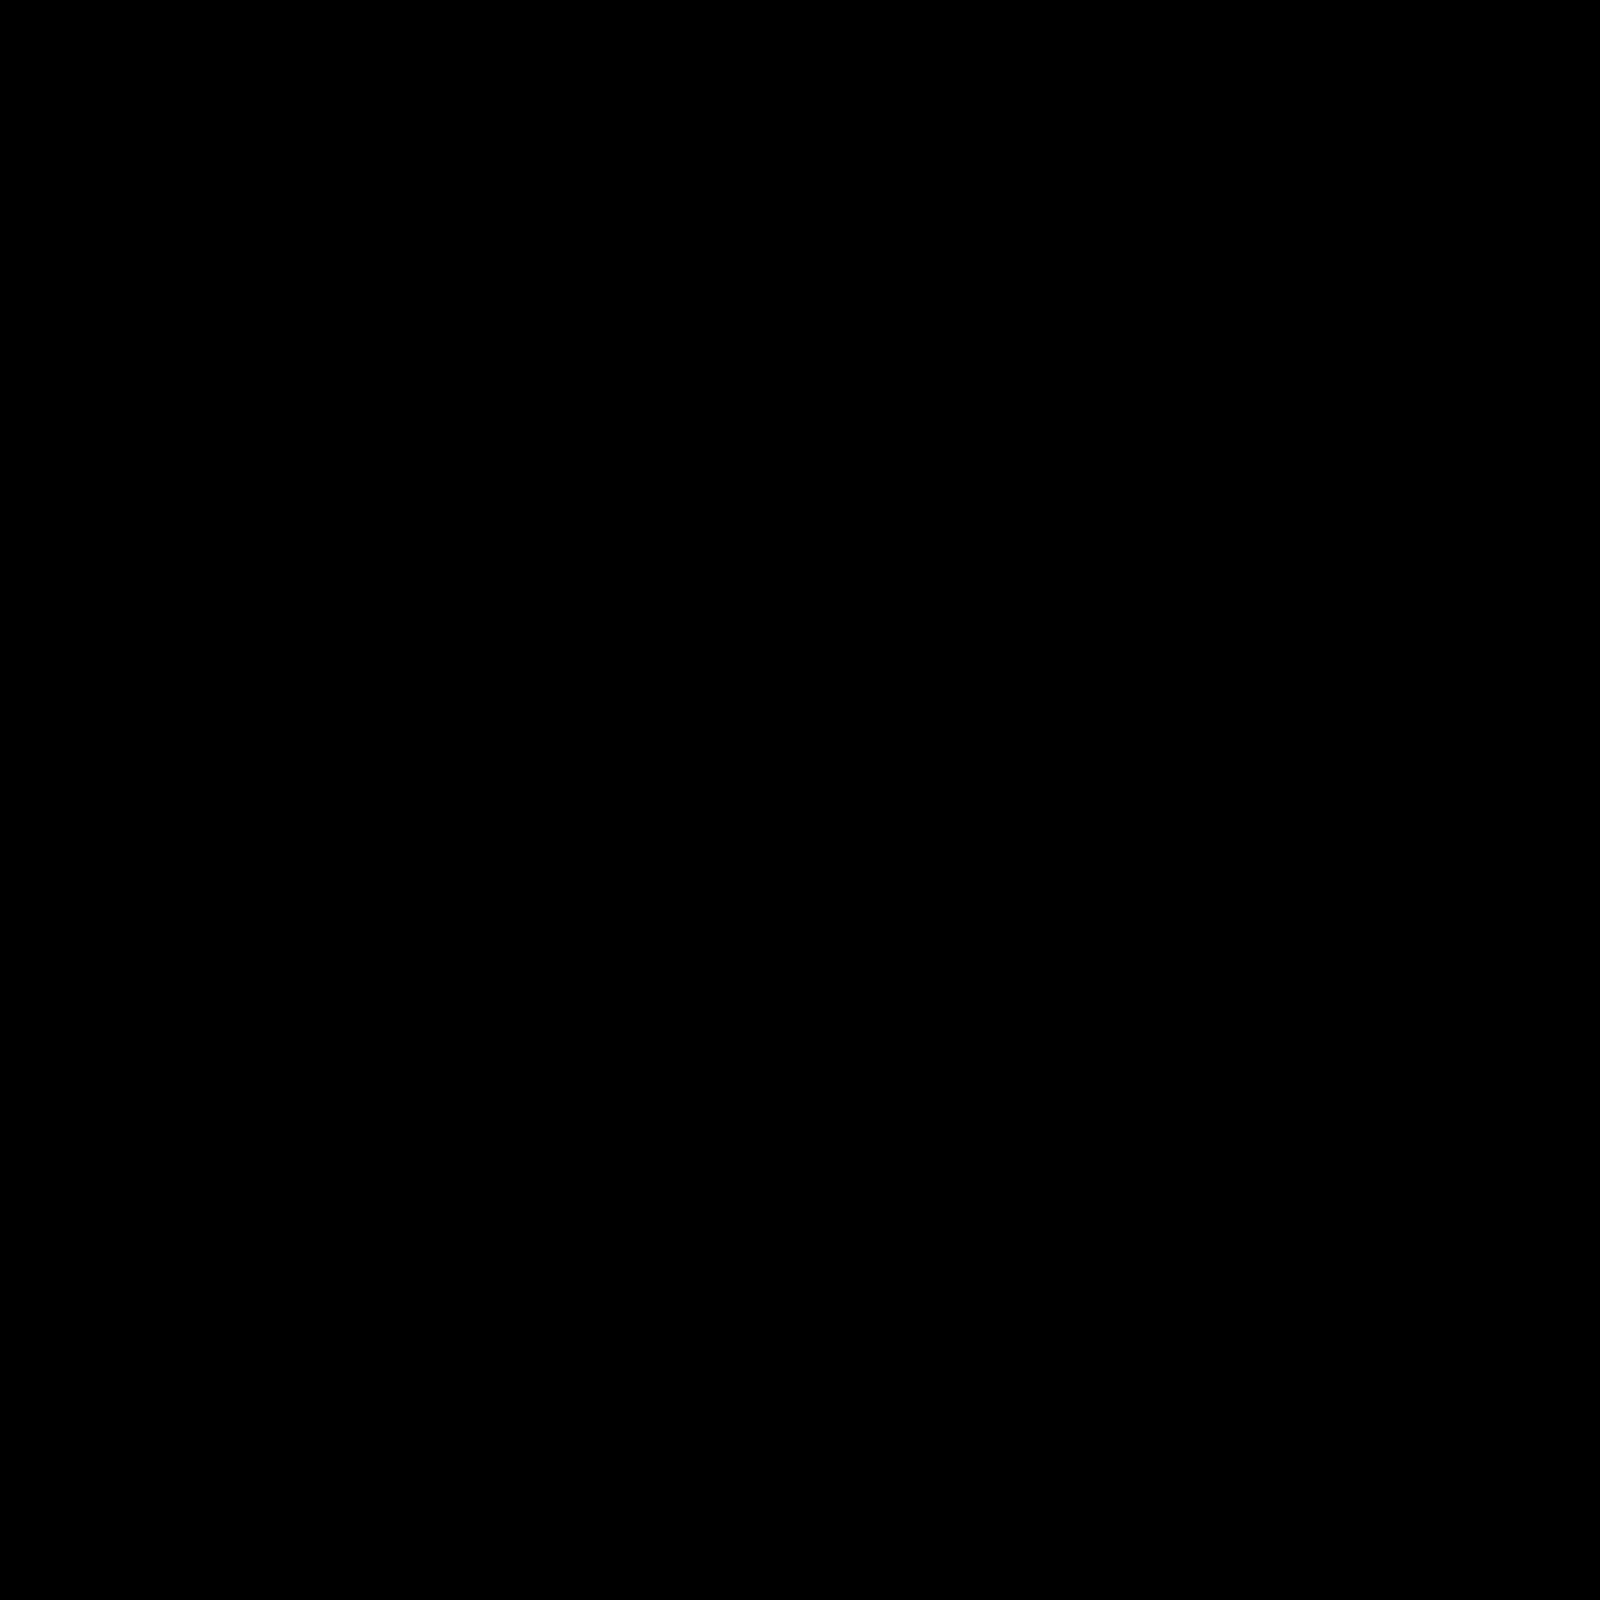 4 of Spades icon